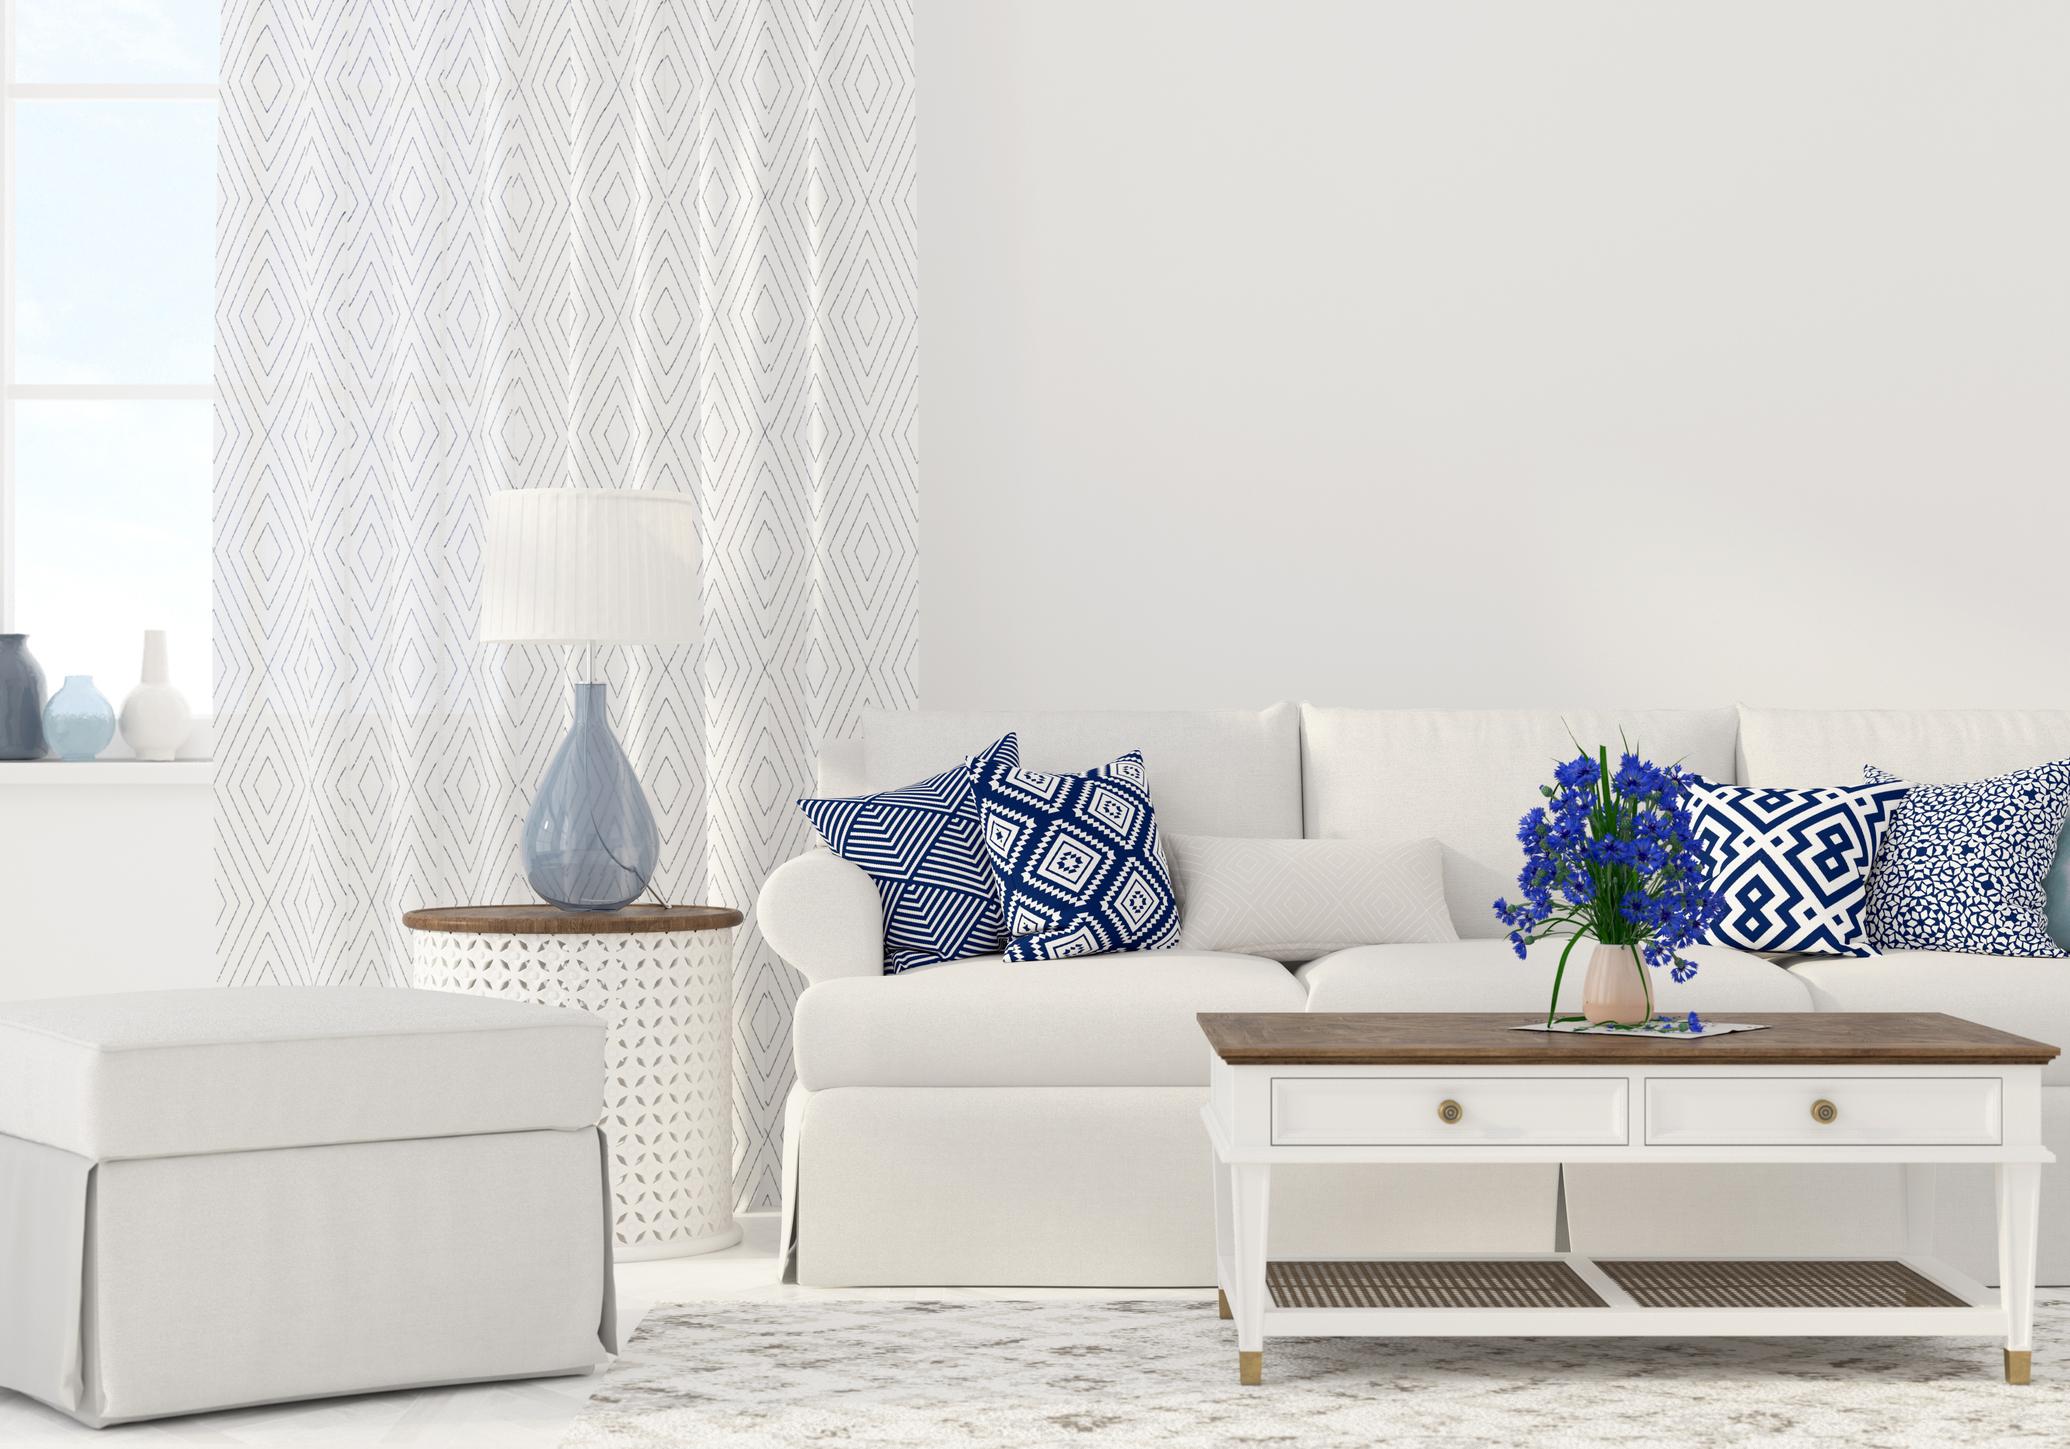 living room home decor getty